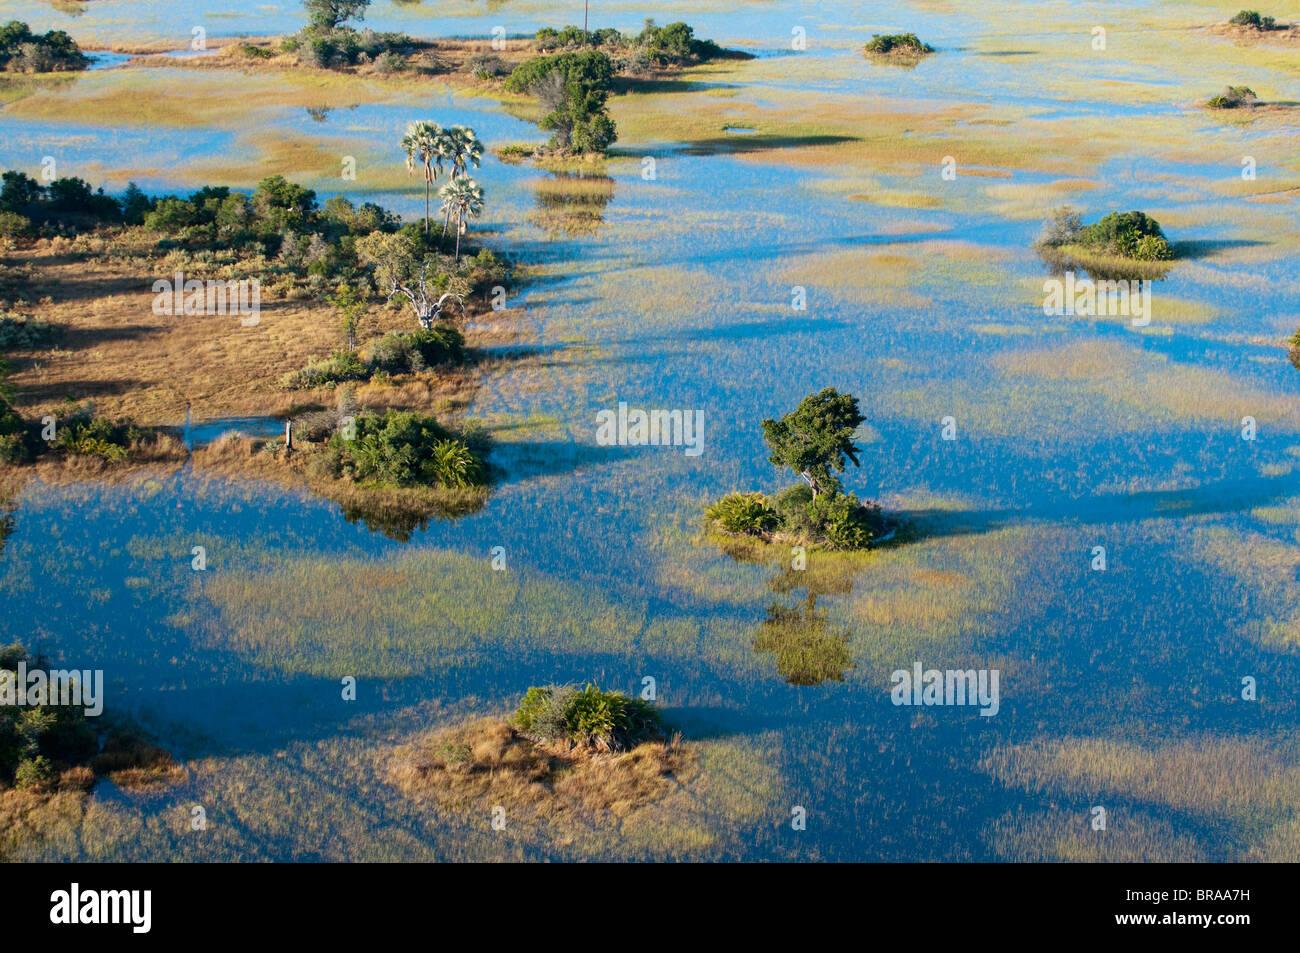 Aerial view of Okavango Delta, Botswana, Africa - Stock Image